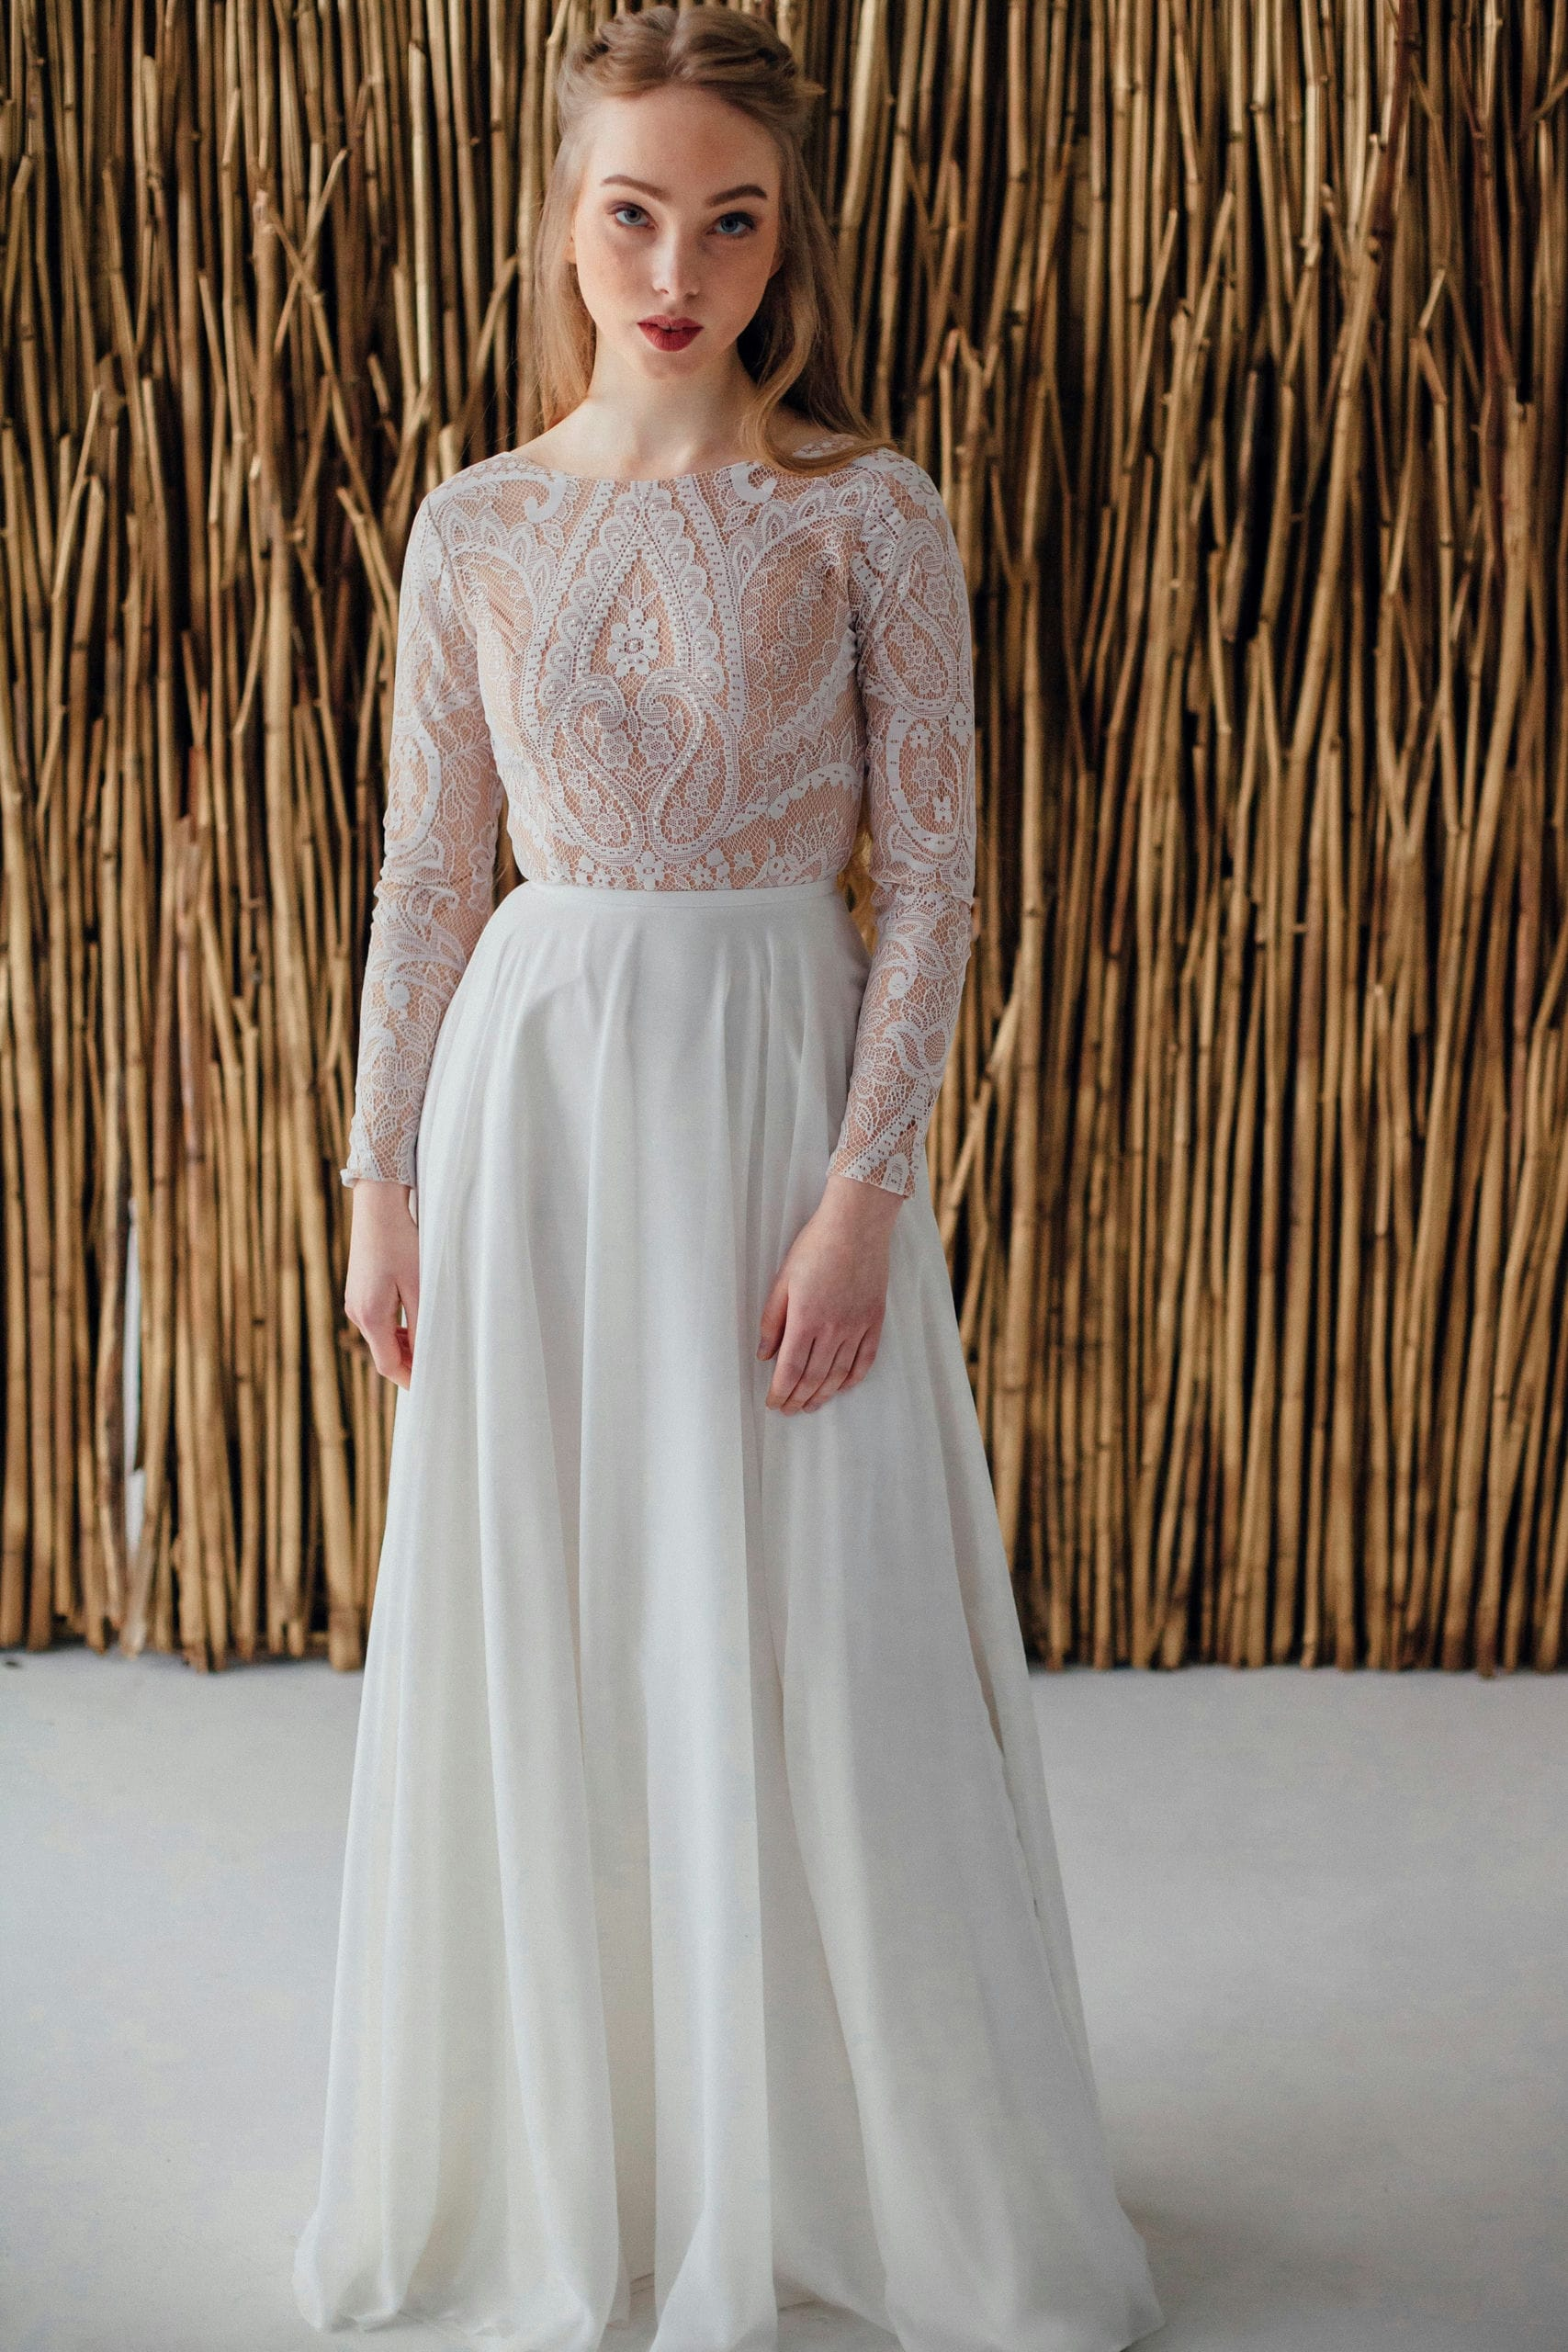 Свадебное платье GILL, коллекция MAGIC OF TENDERNESS, бренд LORA SONG, фото 1